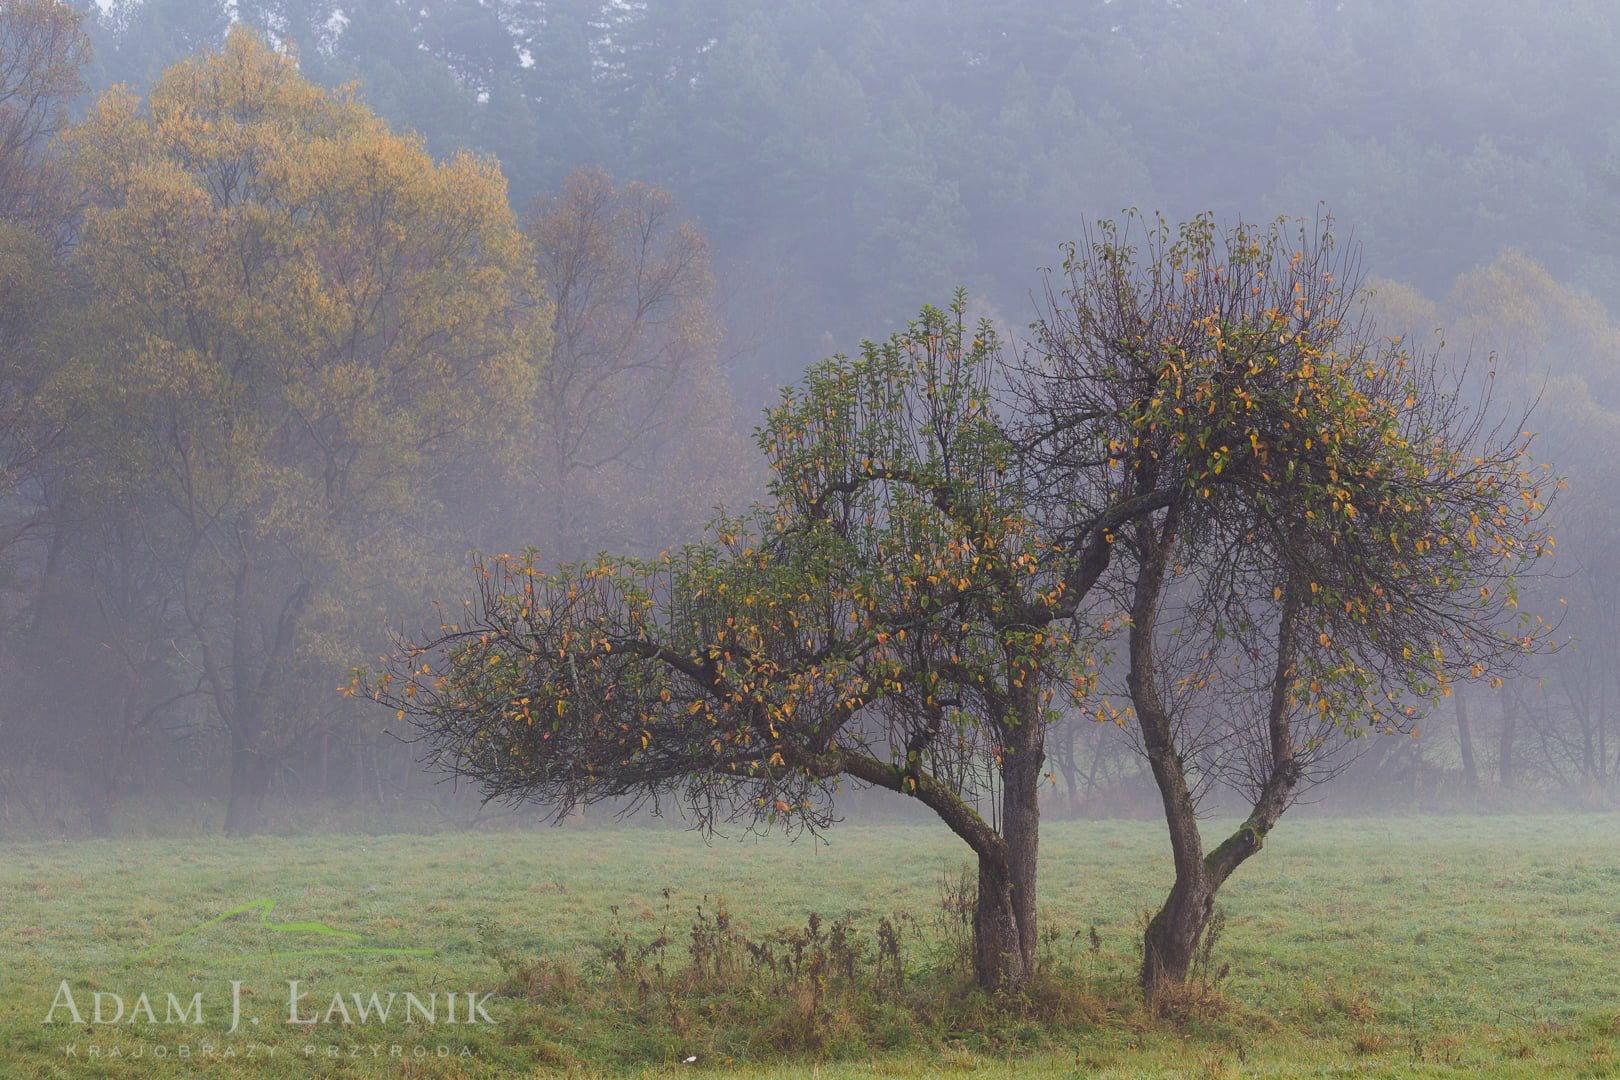 Turnica National Park, Poland 1410-01365C